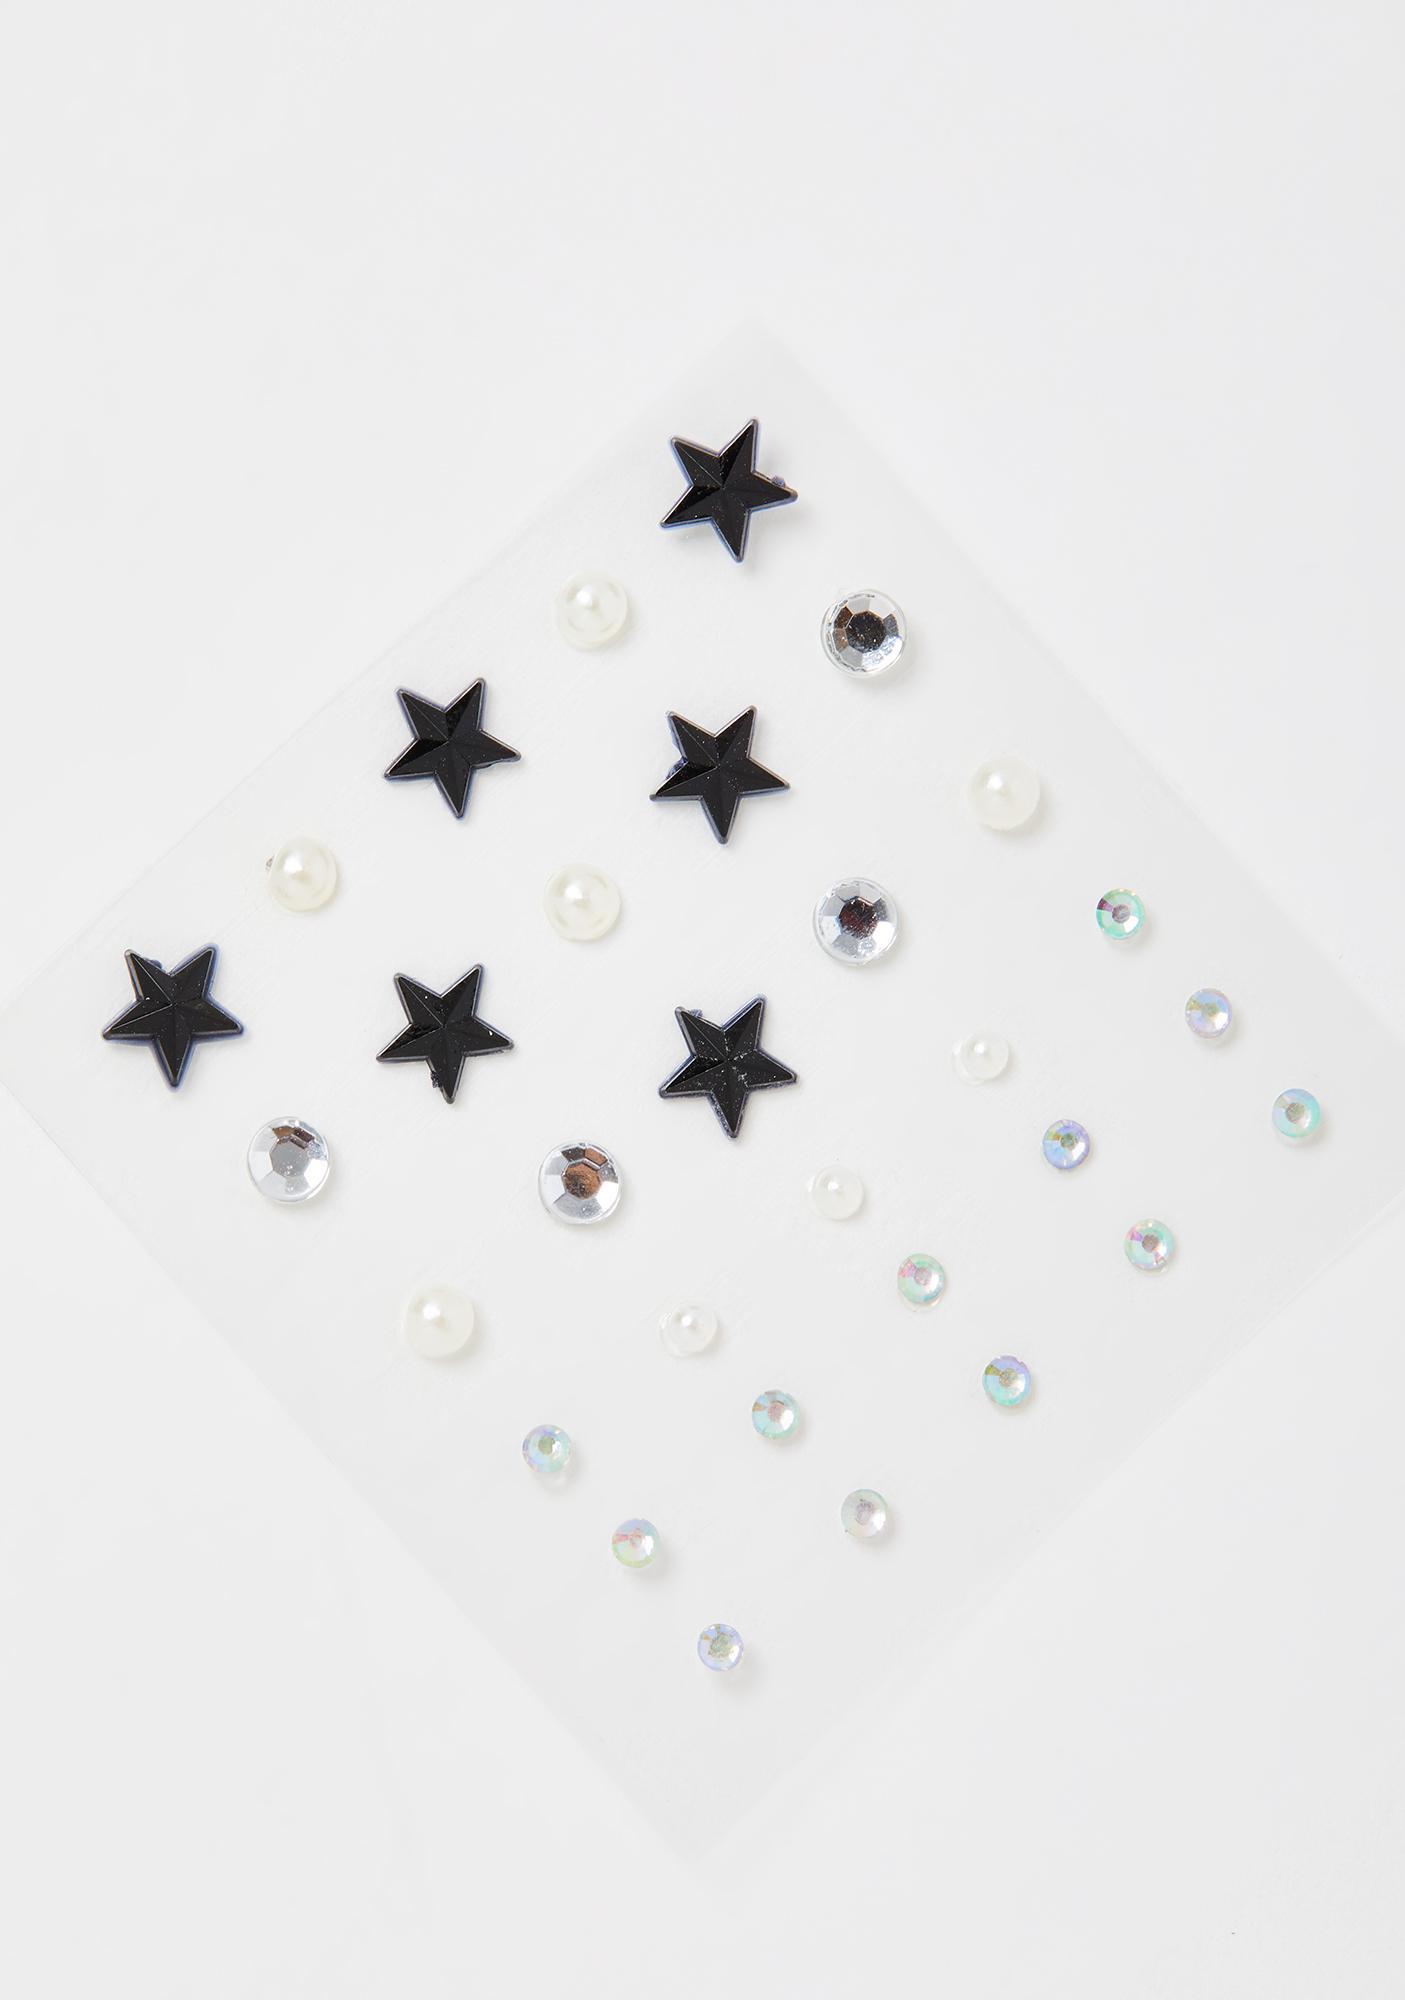 Lunautics Stella Mini Cosmic Crystals Mix Pack